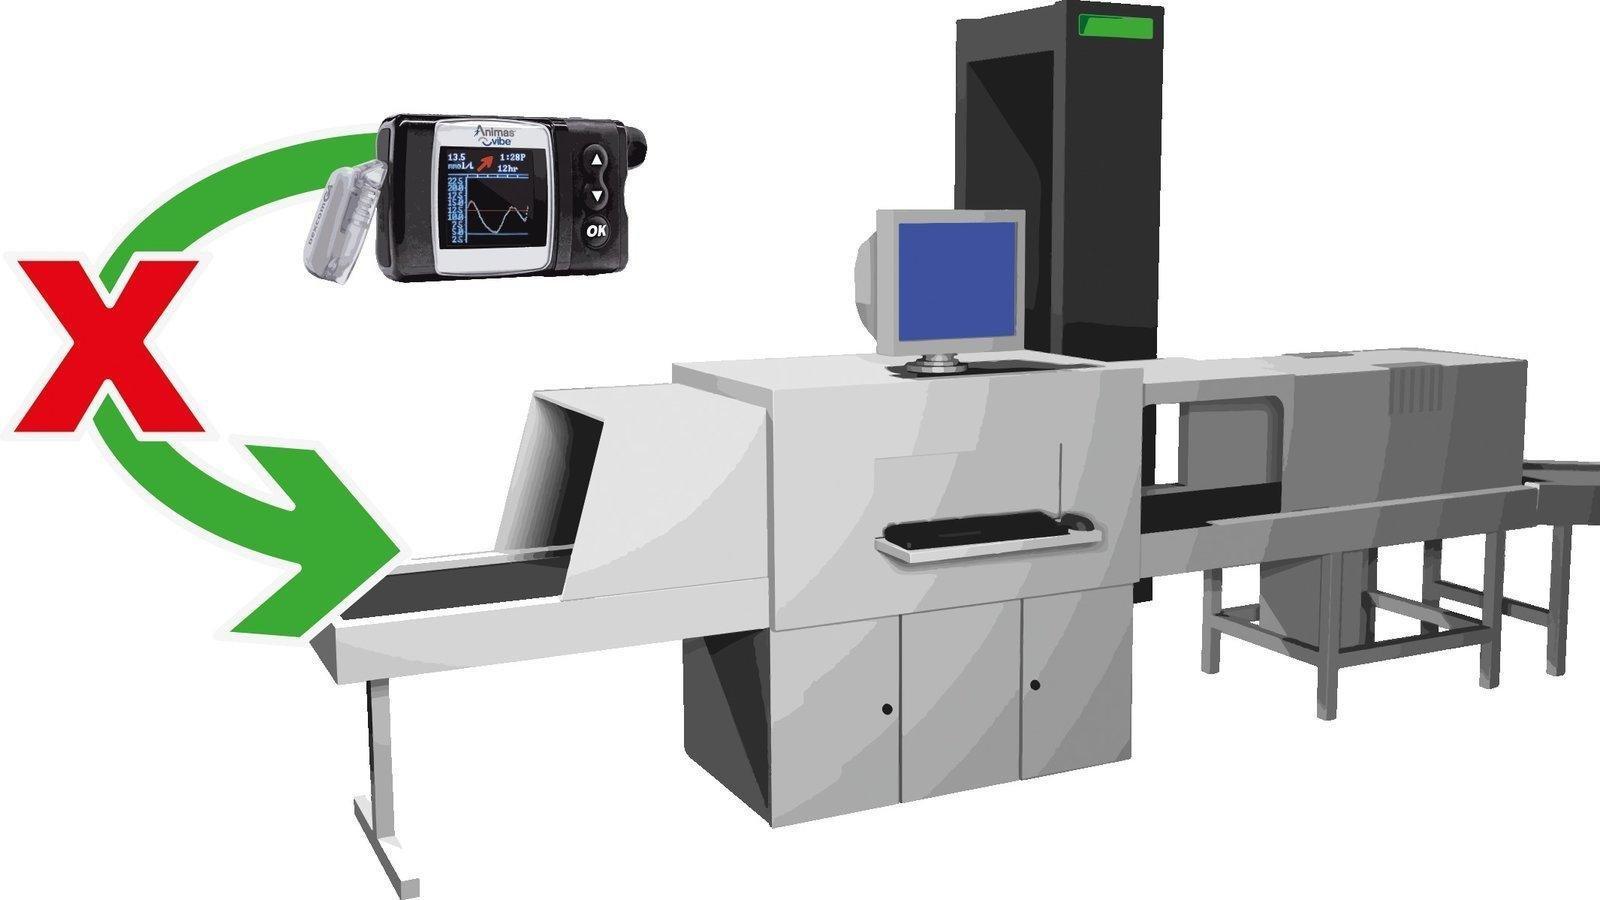 Insulin Pump Airport Body Scanner